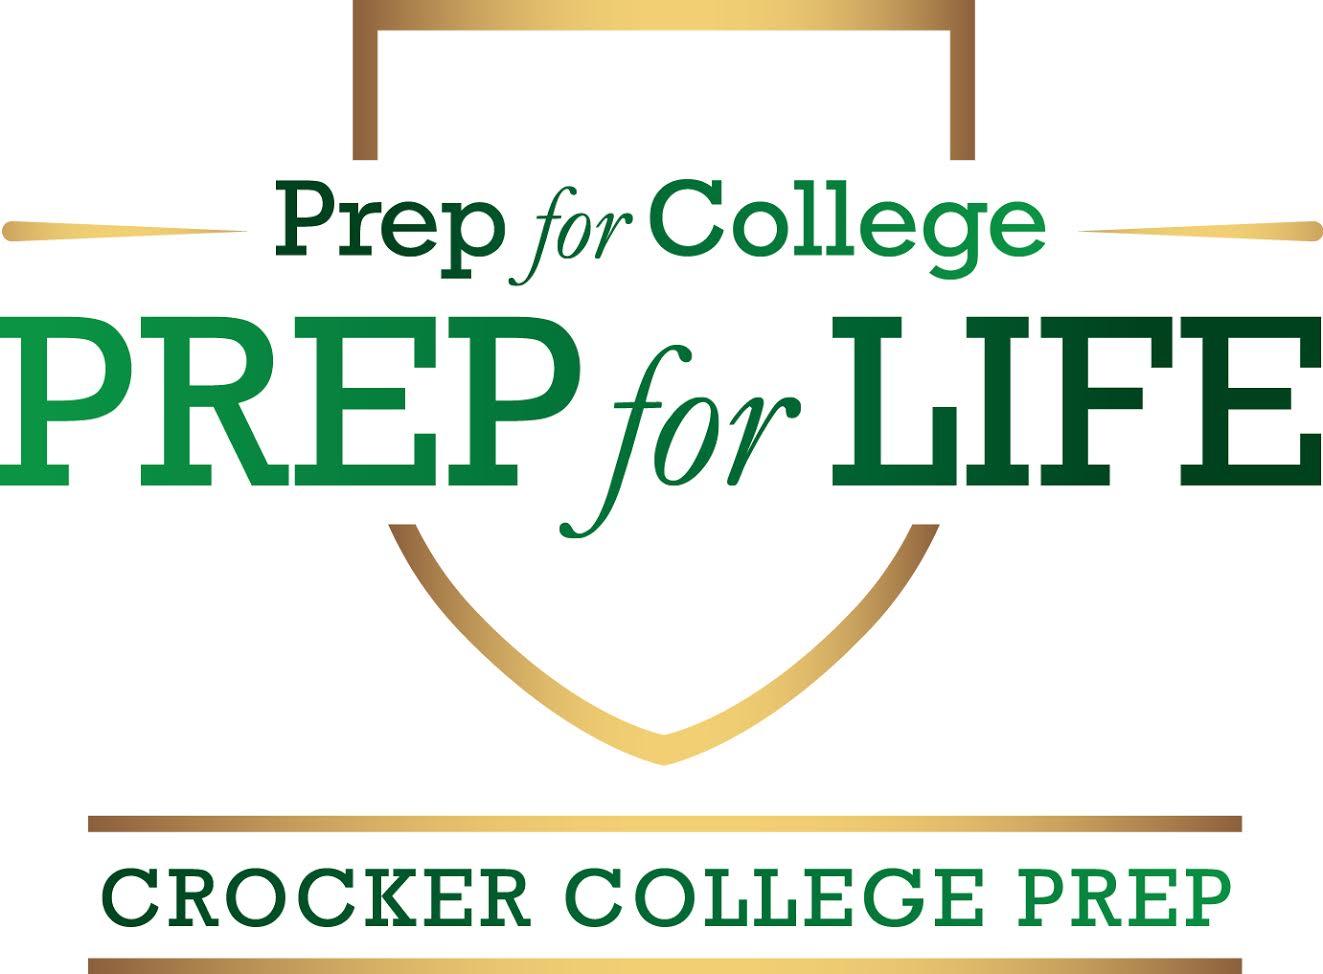 Lawrence D. Crocker College Prep